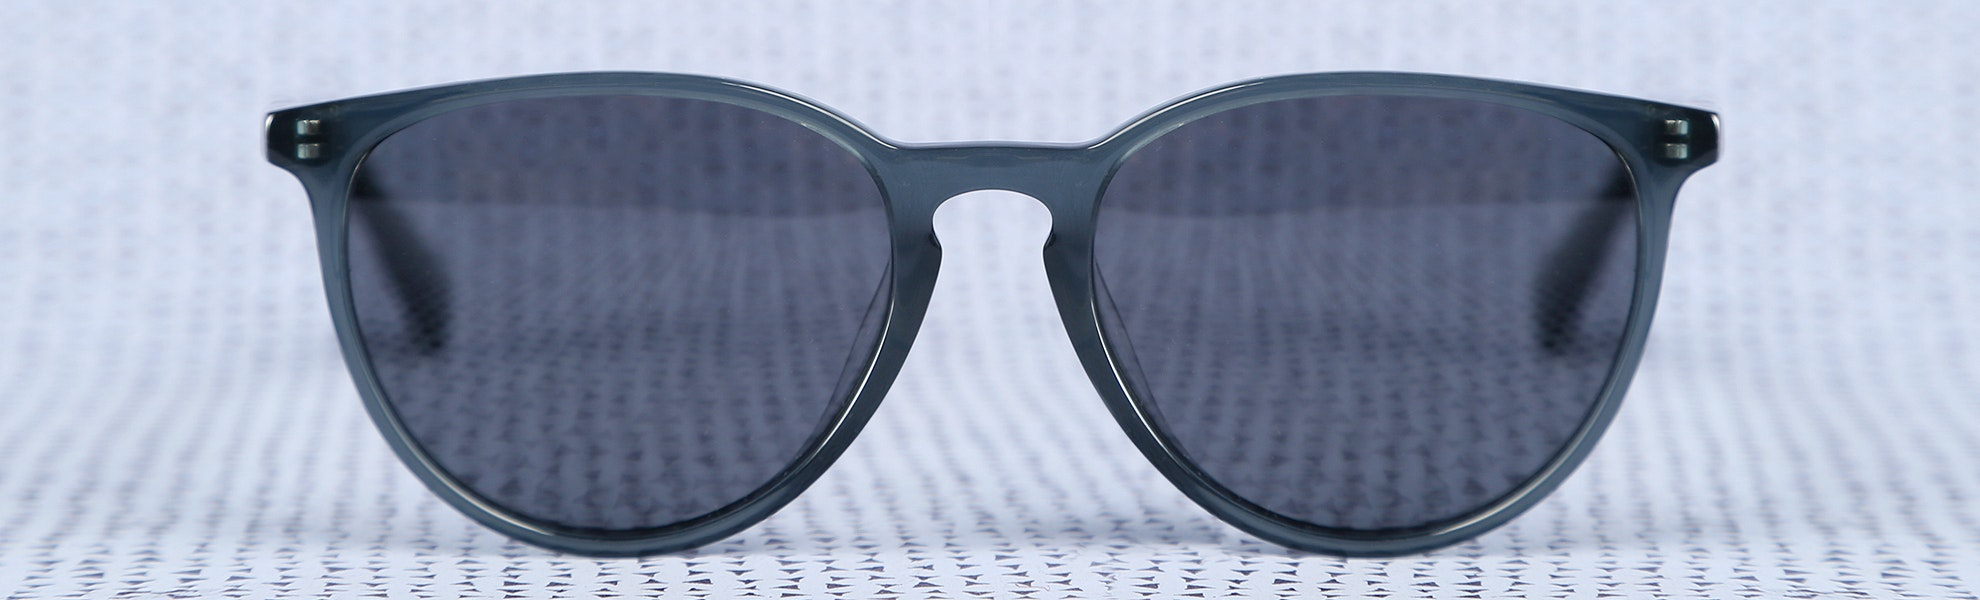 Finlay & Co. Hudson Sunglasses